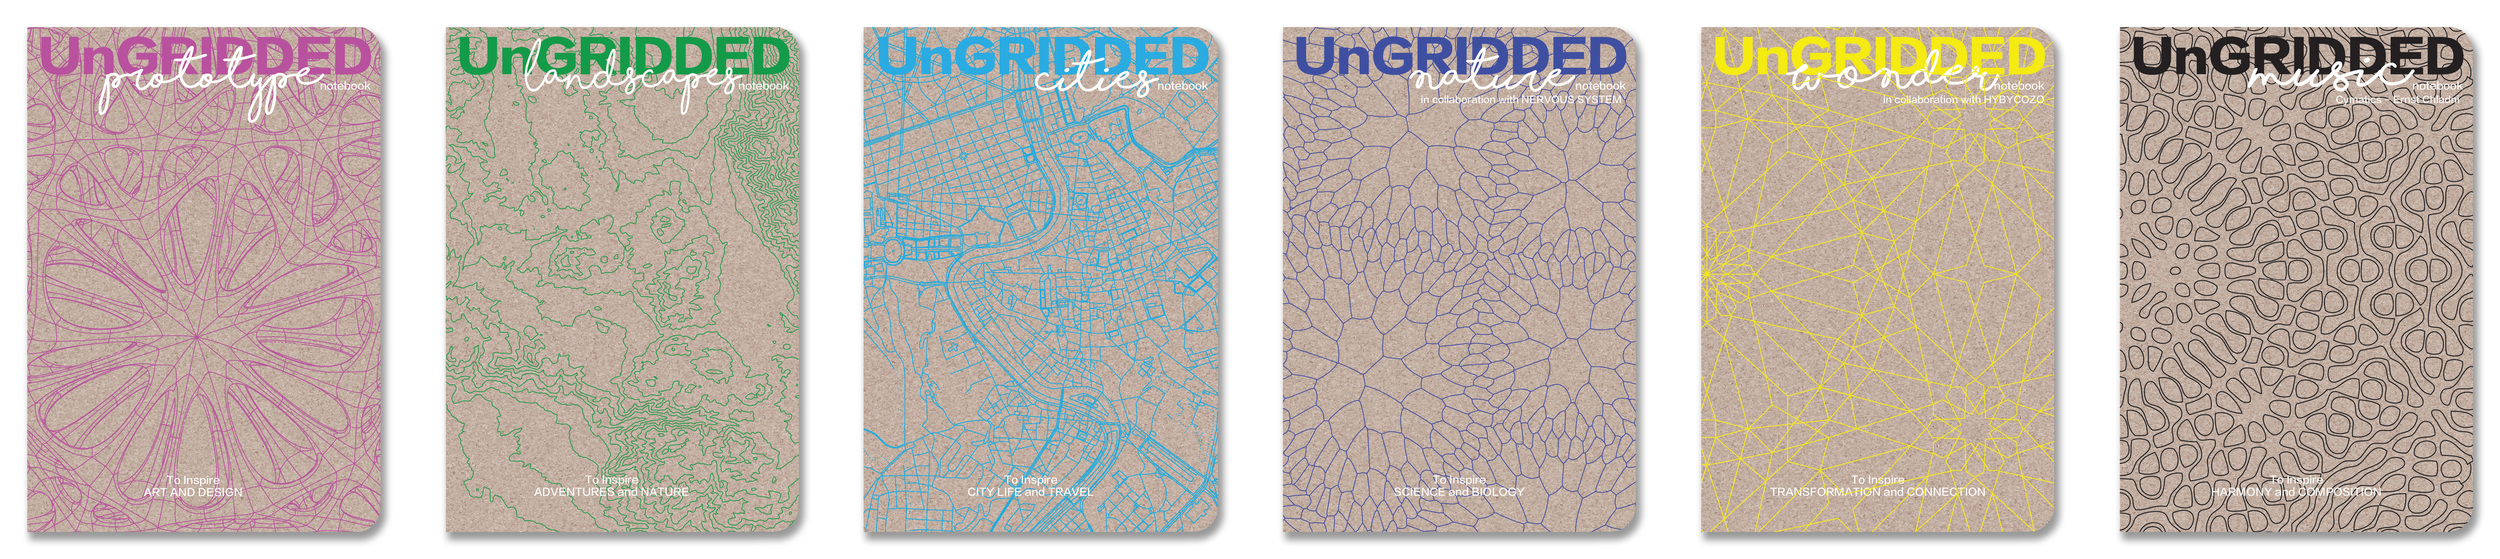 Series I - Prototype - Landscape - Cities & Series II  - Nature - Wonder - Music